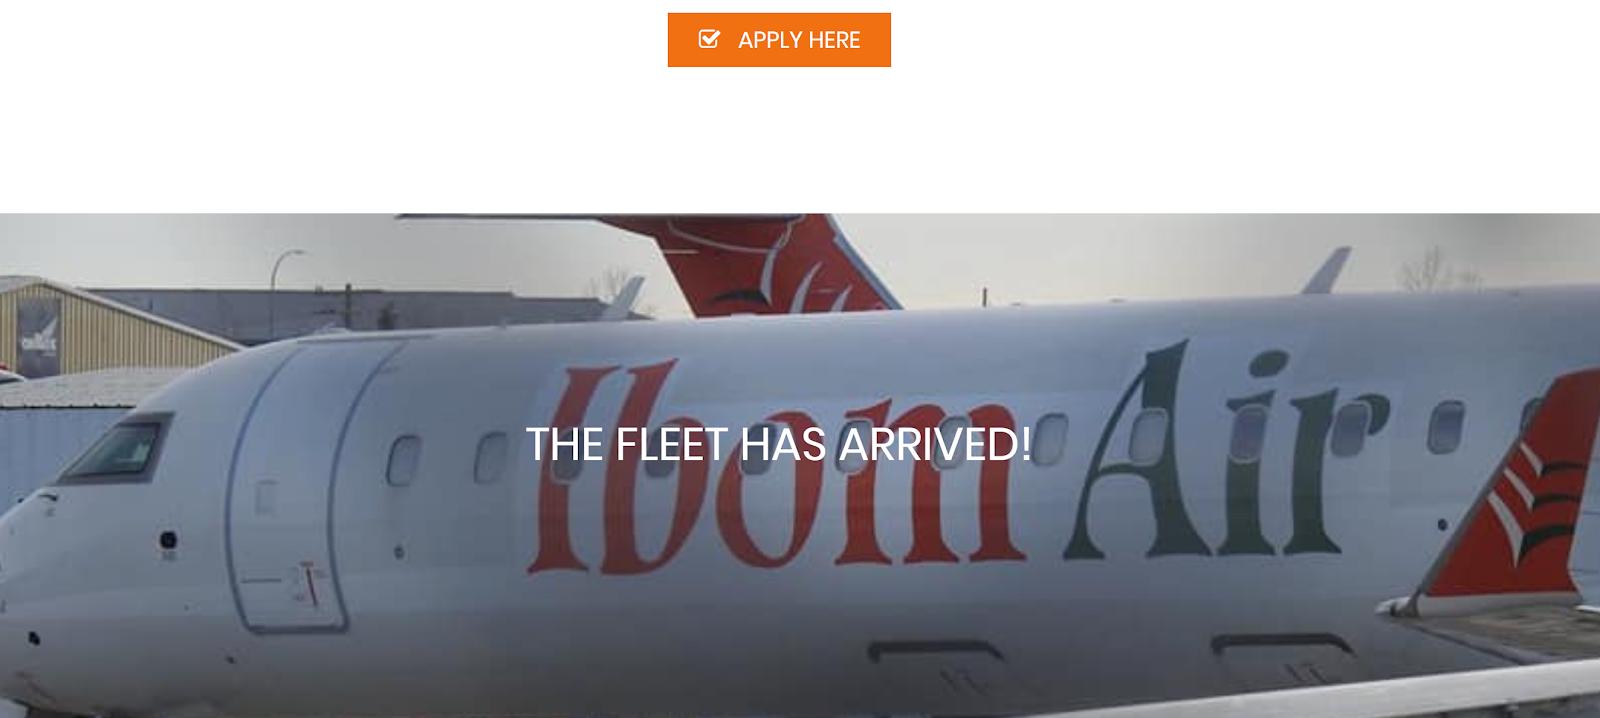 Ibom Air Job Portal